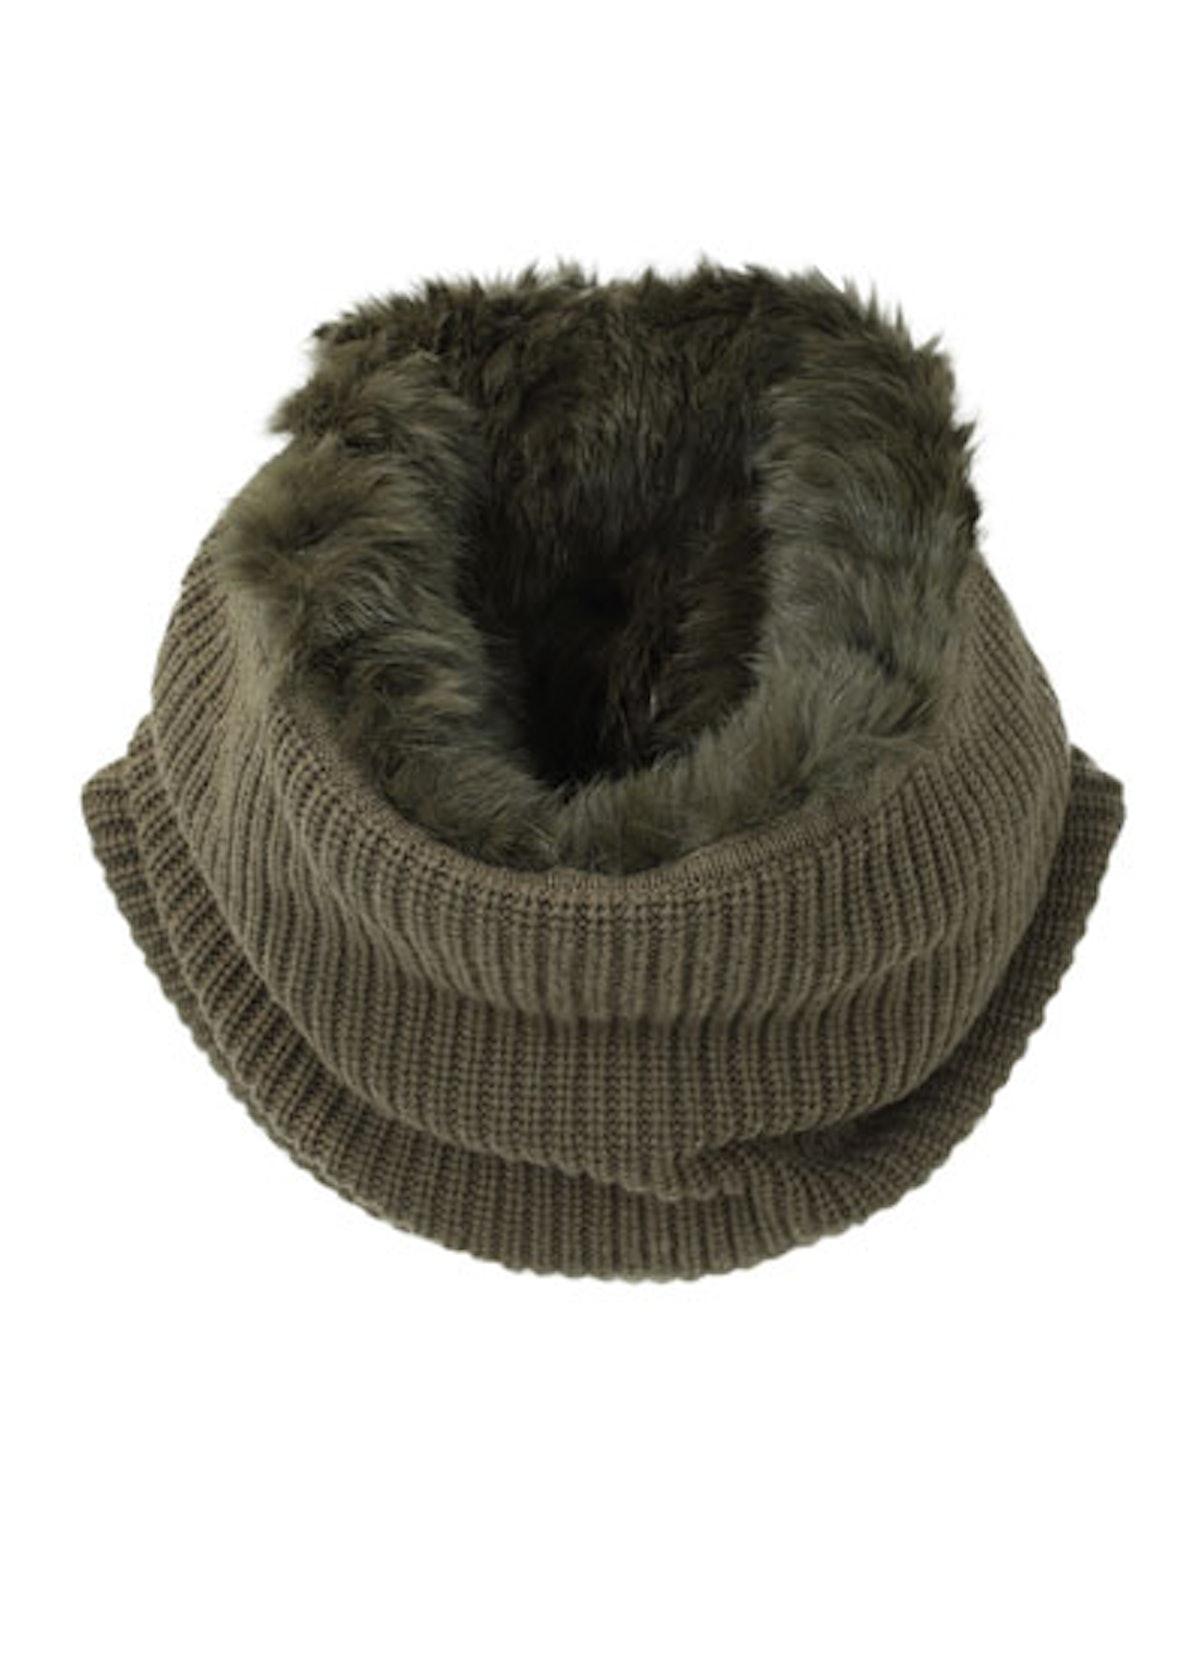 acss-winter-accessories-01-v.jpg